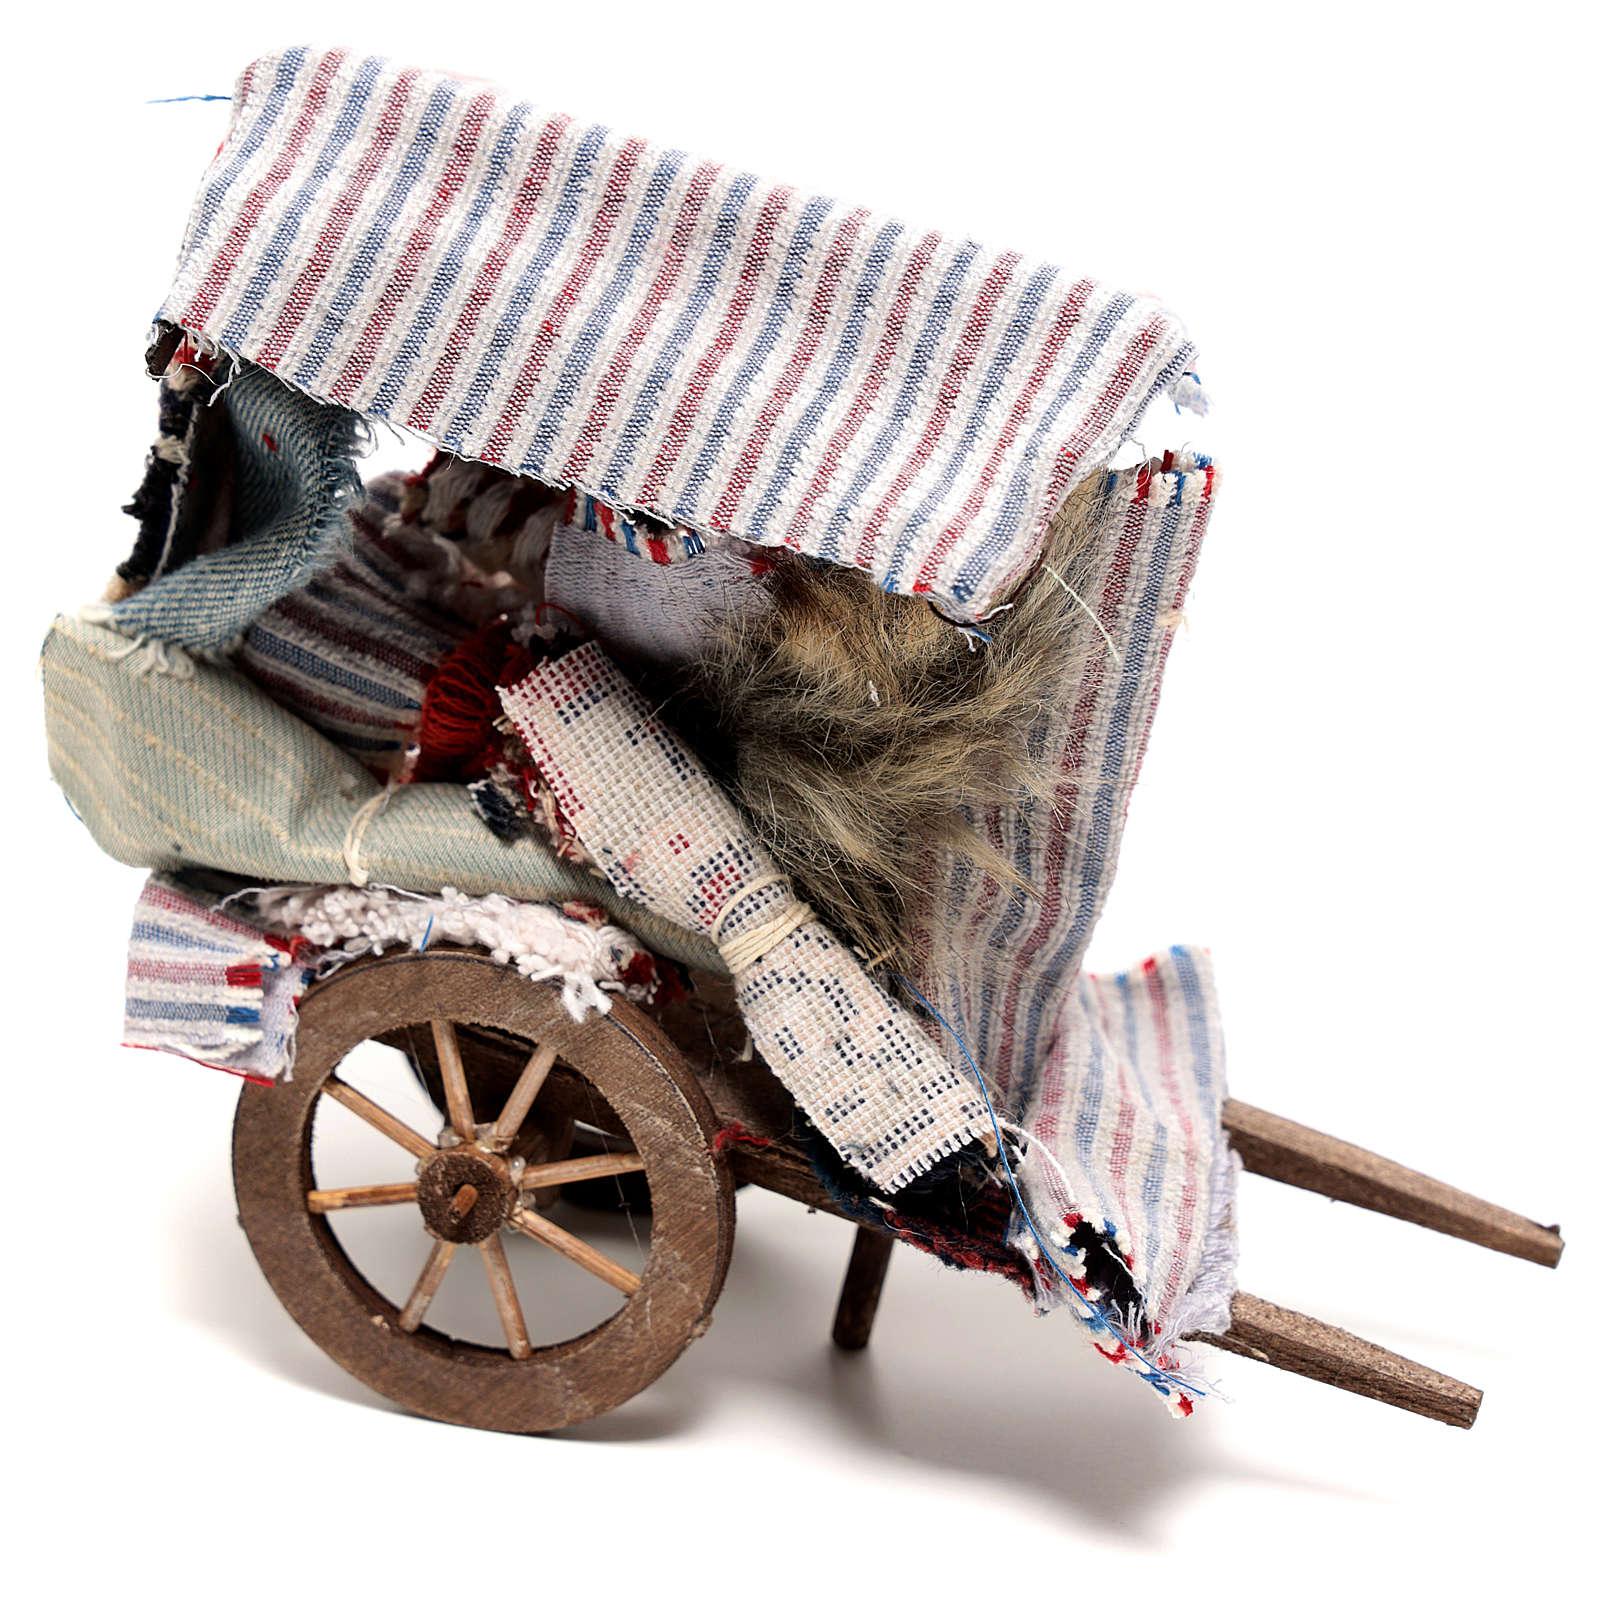 Carpet seller cart of 15x15x5 cm Neapolitan Nativity Scene 14 cm 4